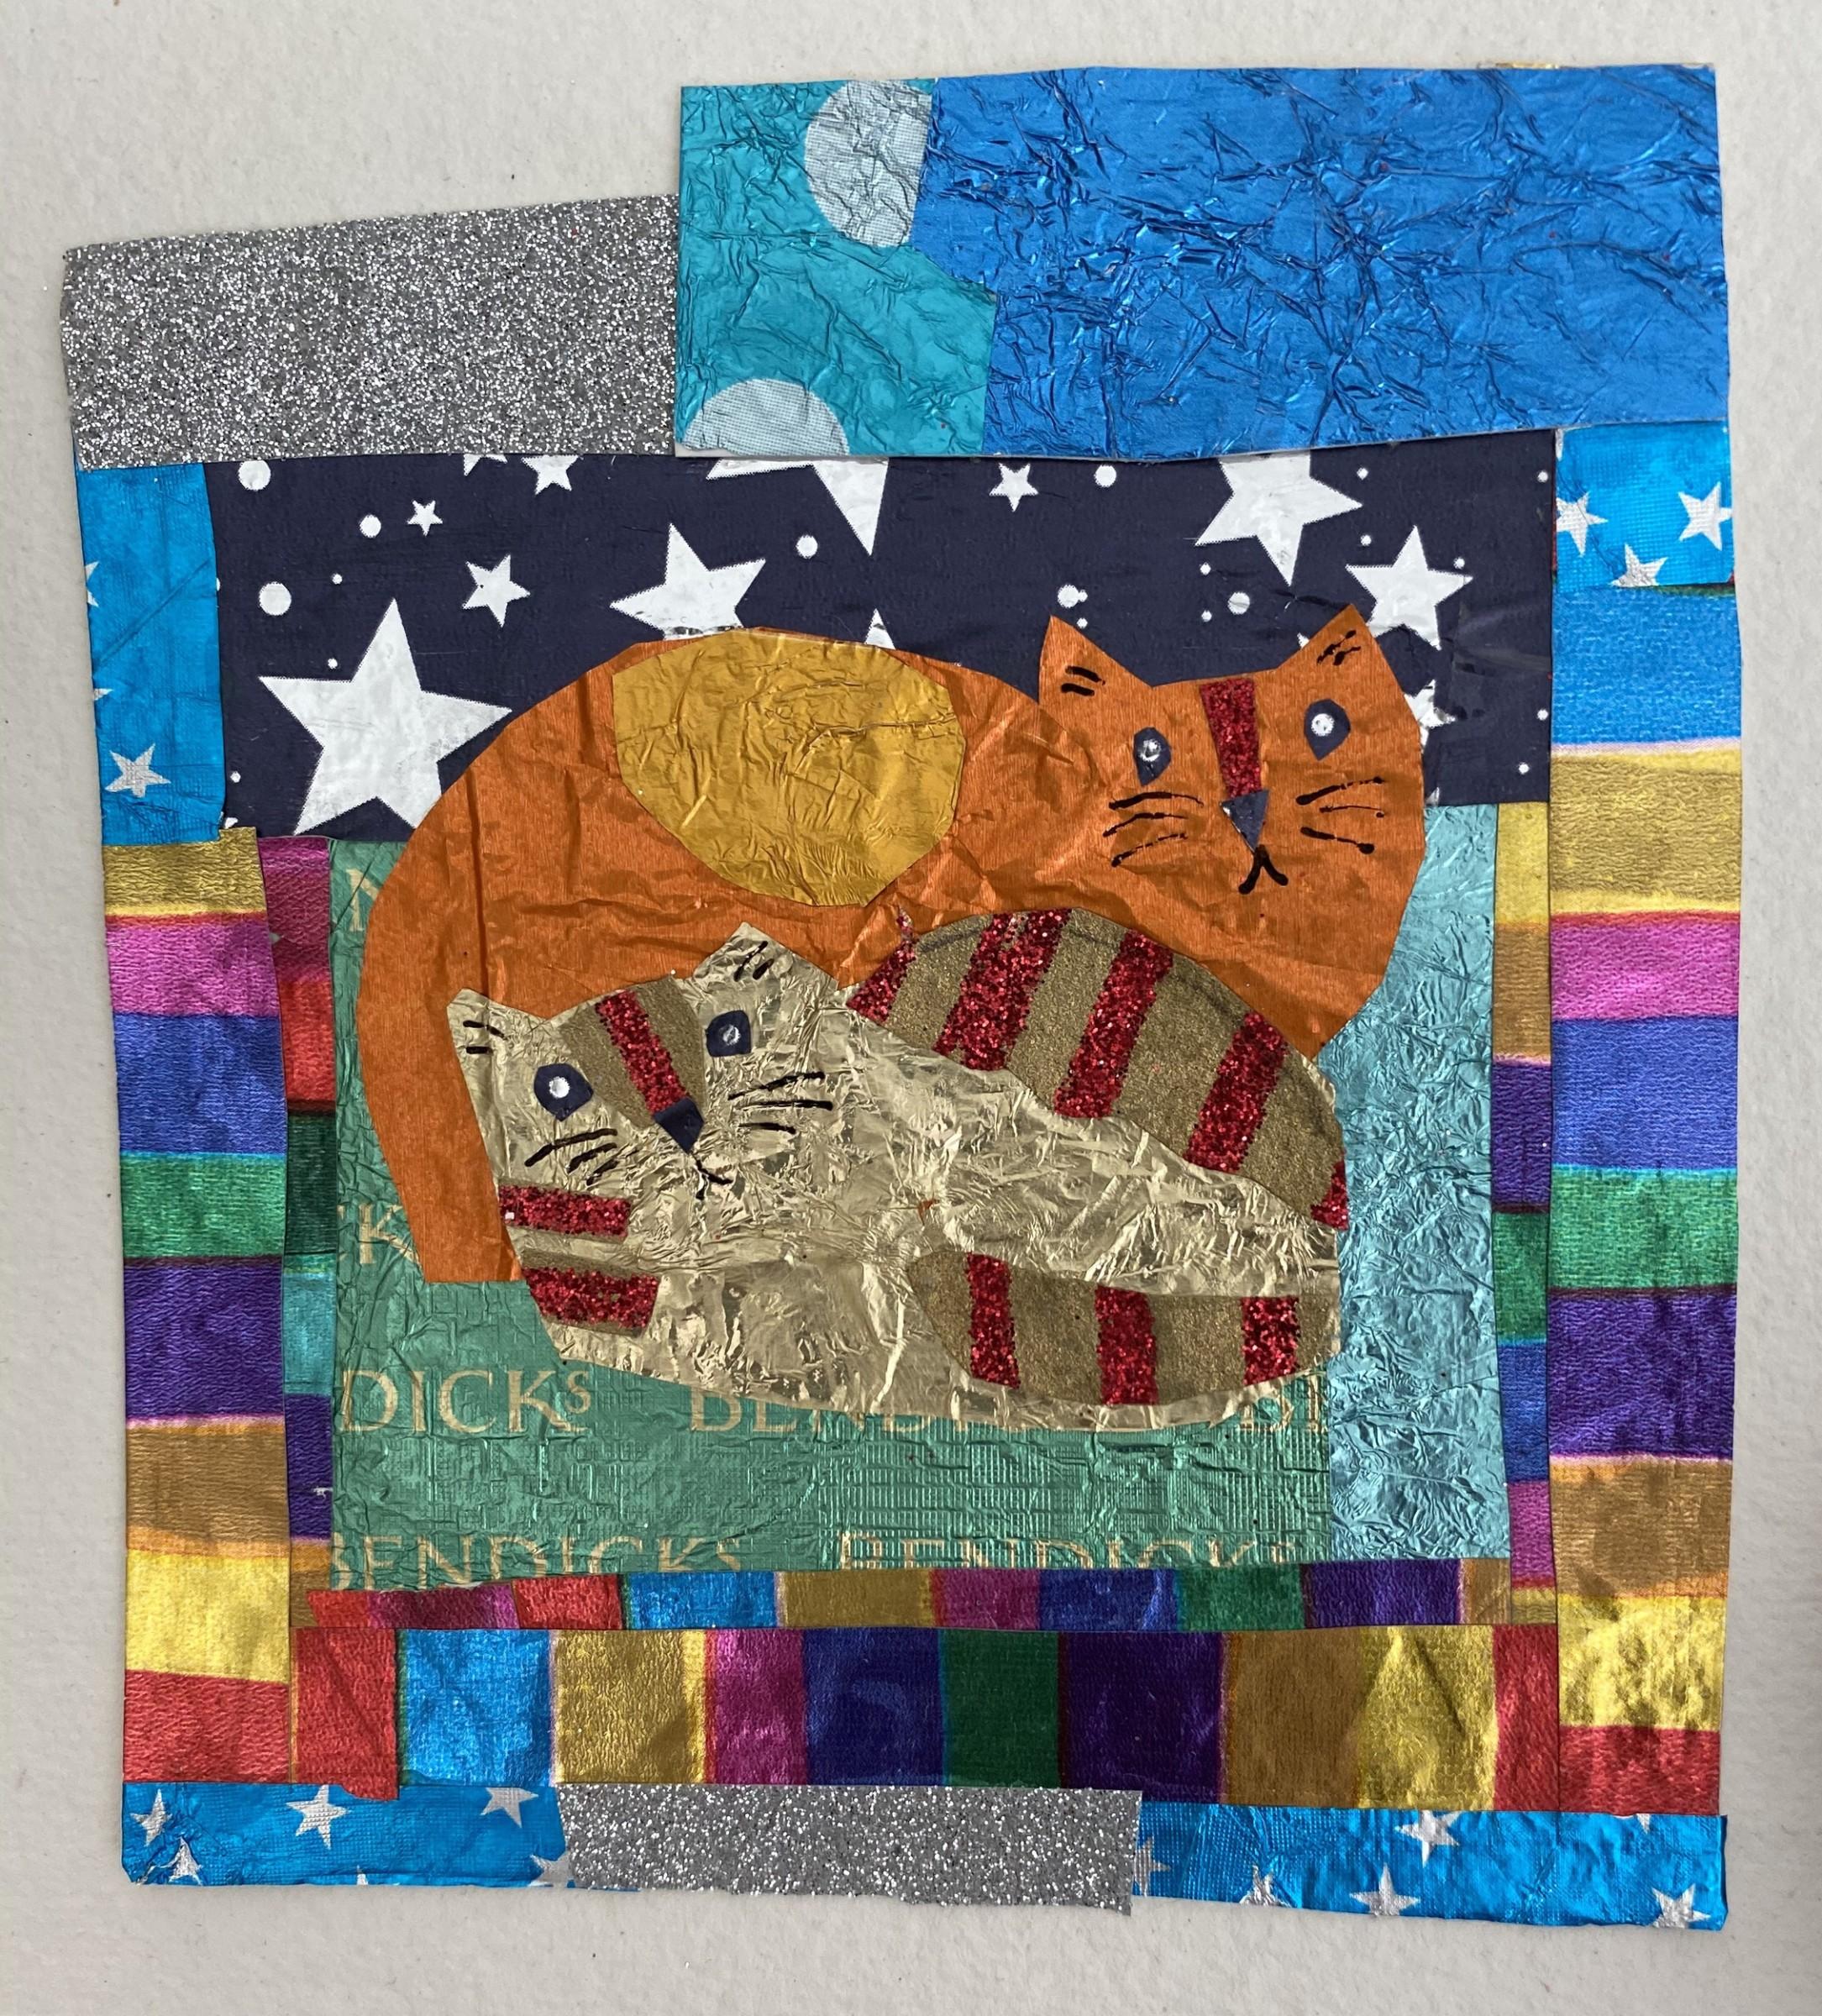 "<span class=""link fancybox-details-link""><a href=""/artists/30-jill-leman/works/12399-jill-leman-little-cats/"">View Detail Page</a></span><div class=""artist""><span class=""artist""><strong>Jill Leman</strong></span></div><div class=""title""><em>Little Cats</em></div><div class=""medium"">collage of assorted wrapping paper</div><div class=""dimensions"">Frame: 31 x 31 cm<br /> Artwork: 13 x 13 cm</div><div class=""price"">£350.00</div>"